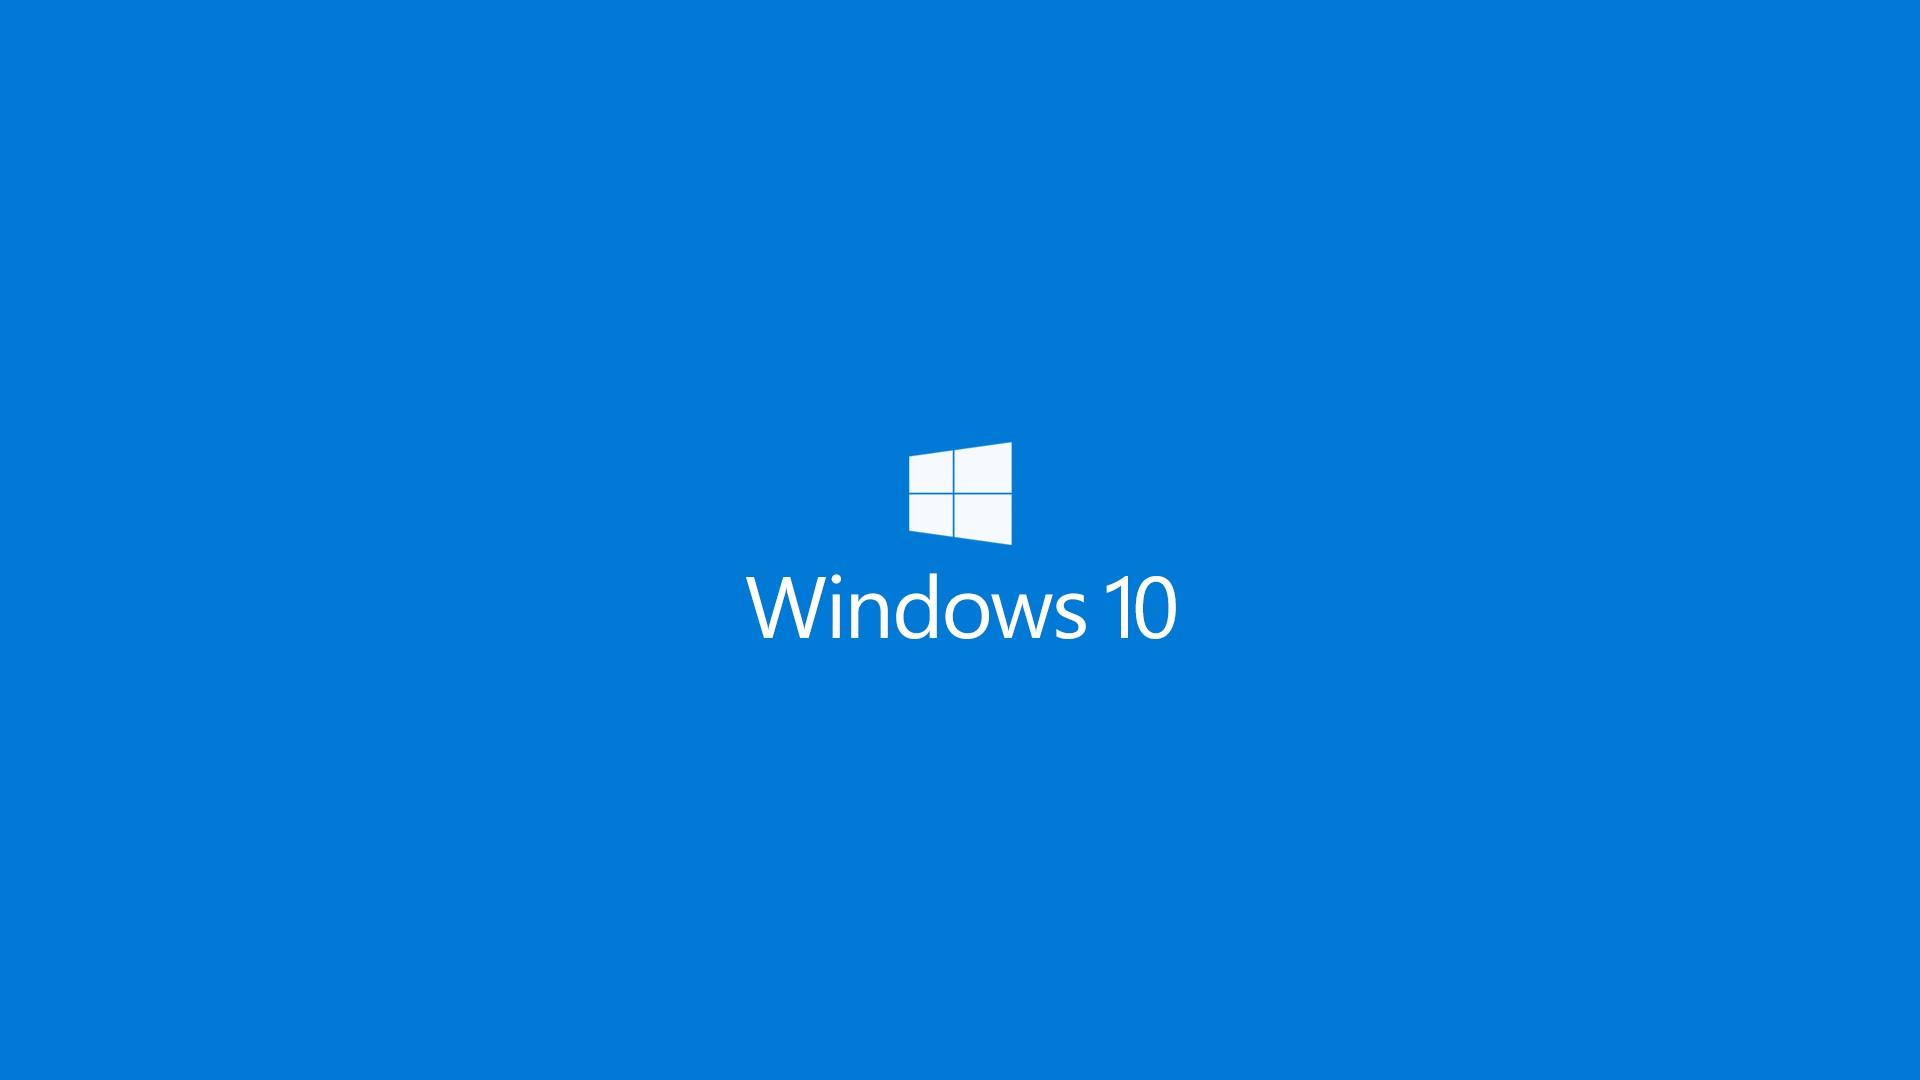 Windows 10 Desktop Wallpaper Download Free Cool Backgrounds